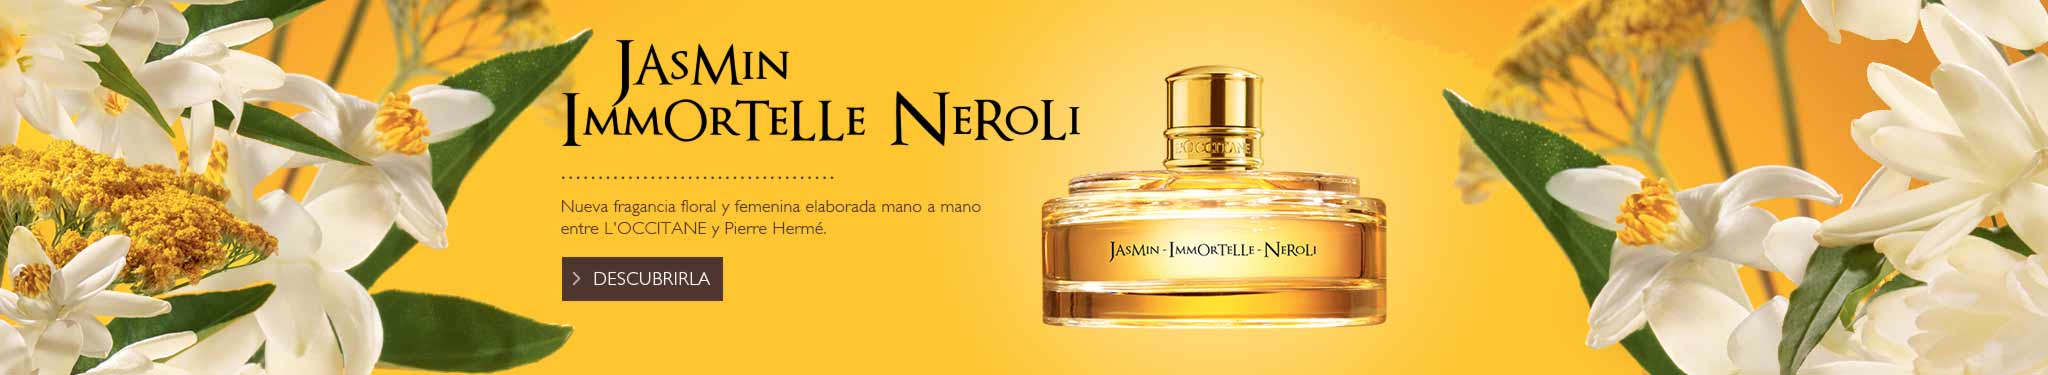 Perfume floral L'OCCITANE